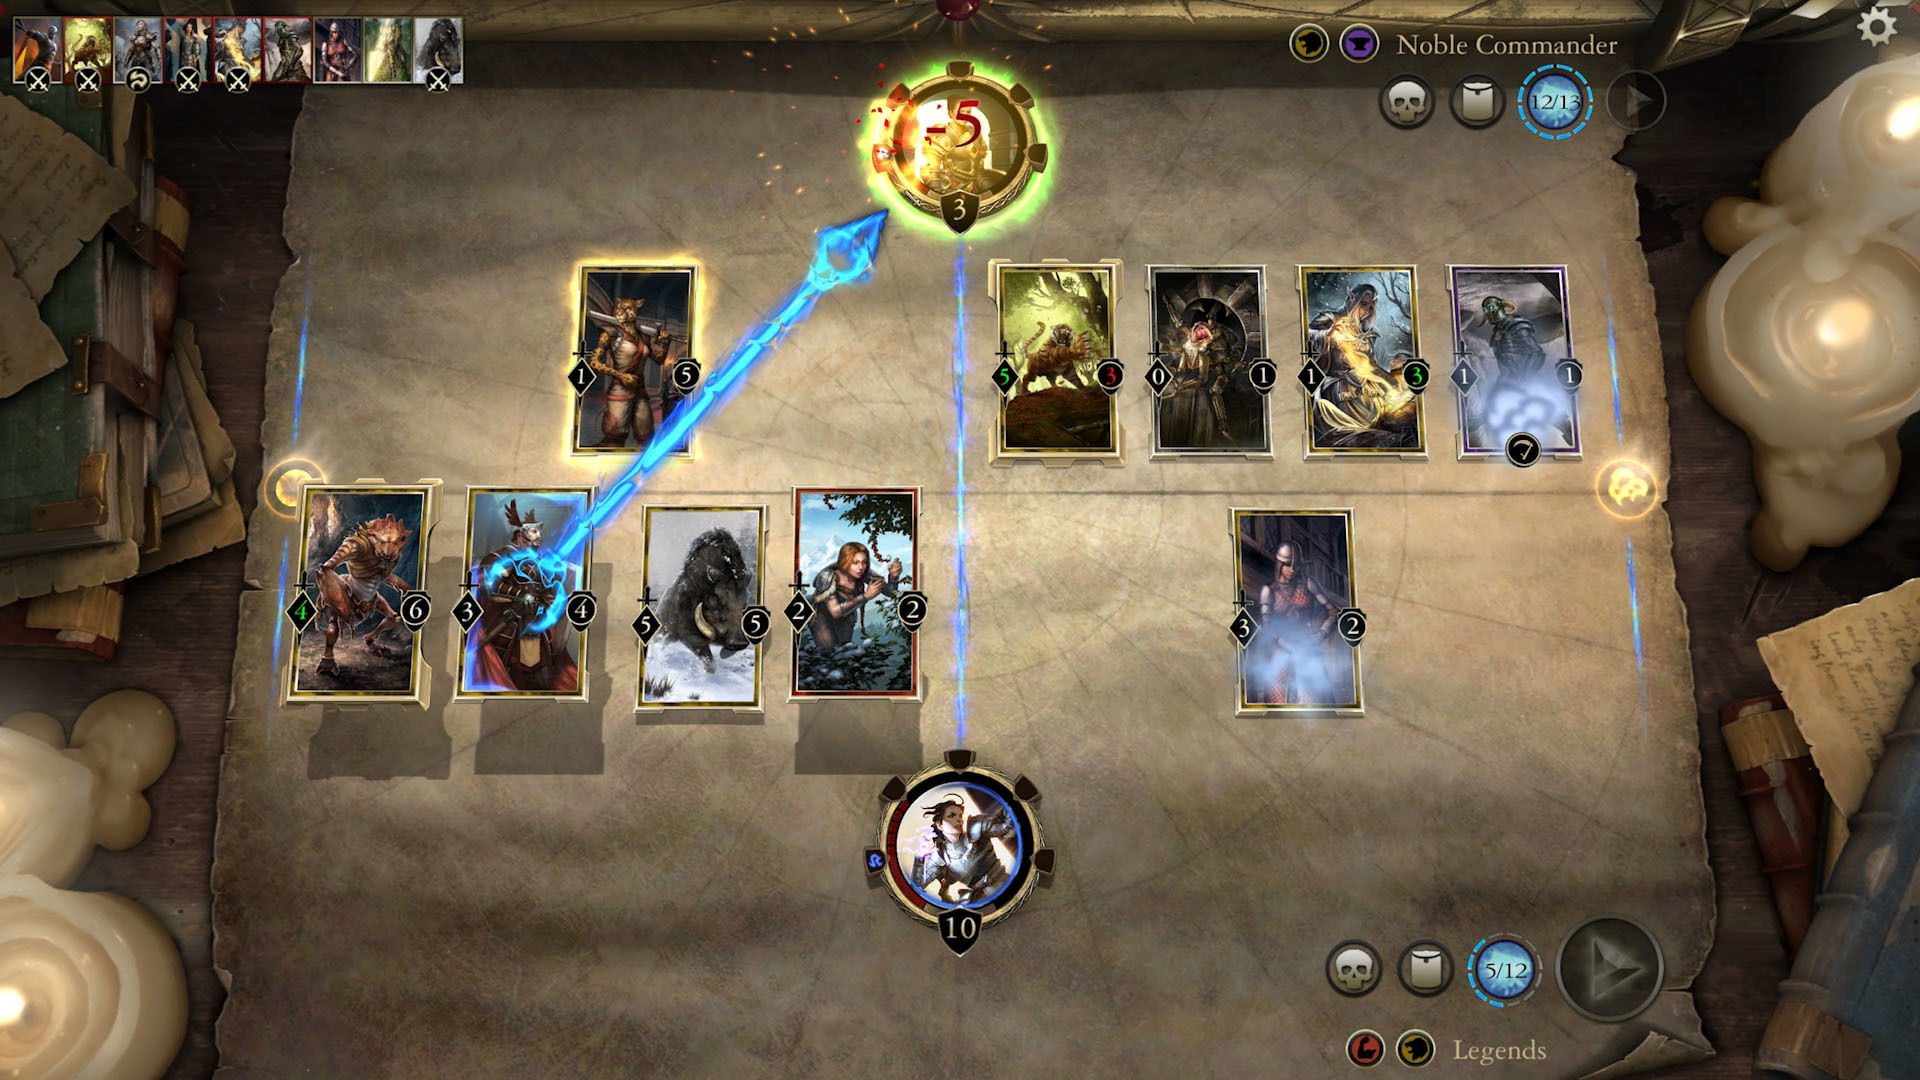 Elder Scrolls Legends: Bethesda's F2P Digital CCG - Games - Quarter